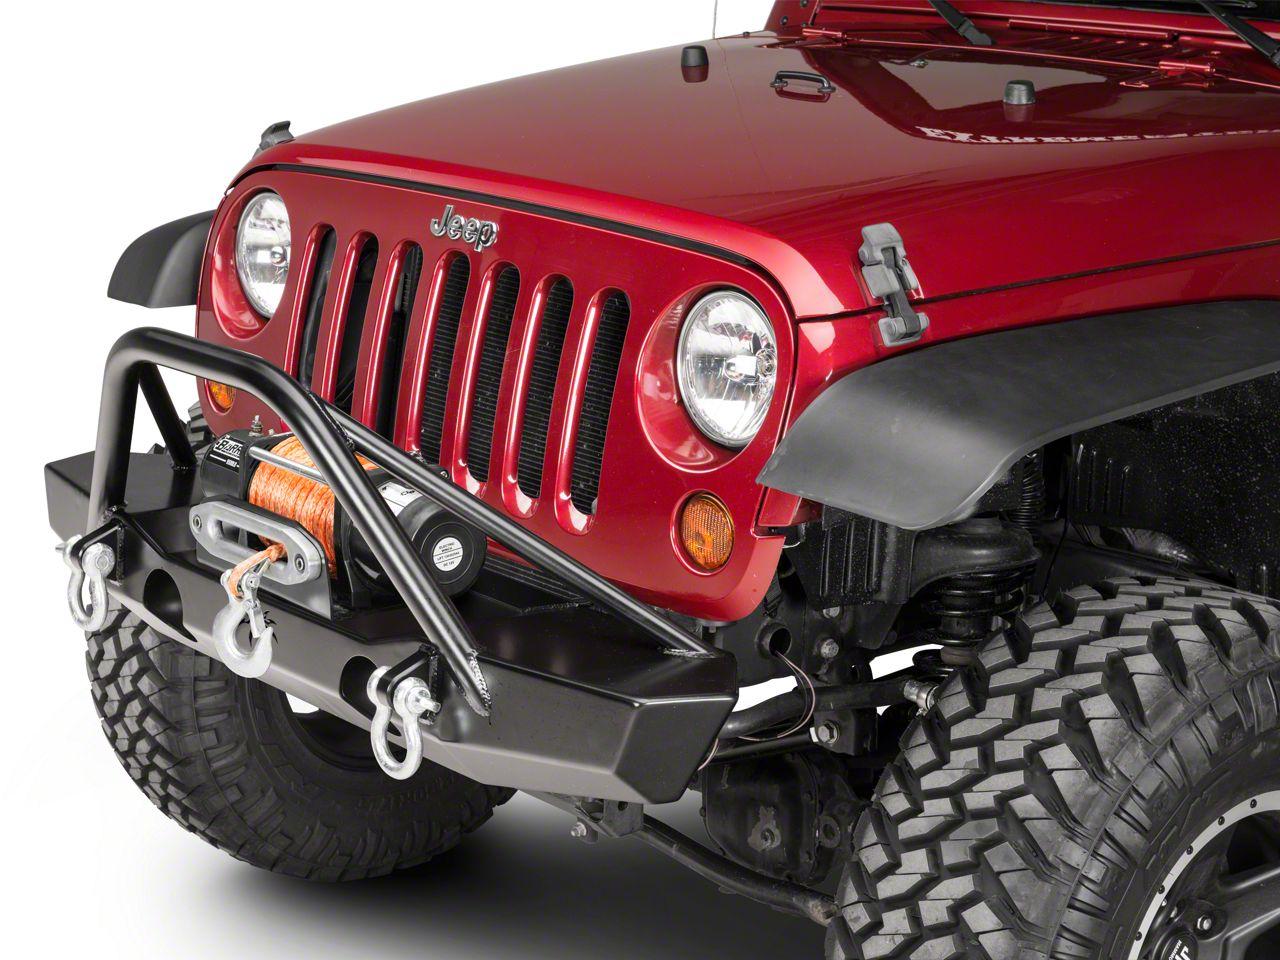 Poison Spyder Brawler MID Width Front Bumper w/ Brawler Bar - SpyderShell Armor Coat (07-18 Jeep Wrangler JK)